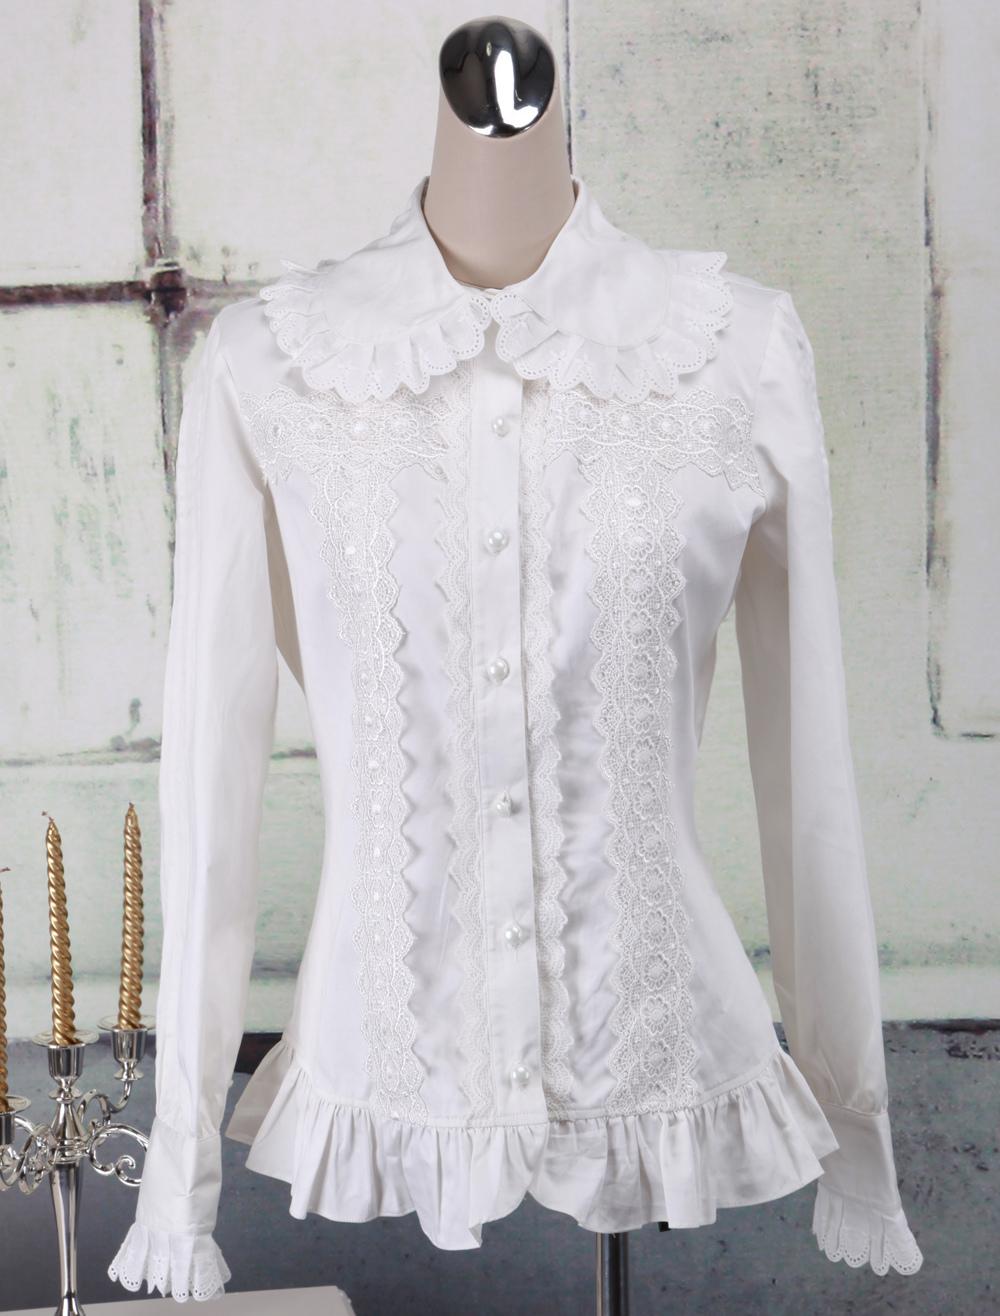 Sweet White Cotton Lolita Blouse Long Sleeves Ruffles Lace Trim Turn-down Collar